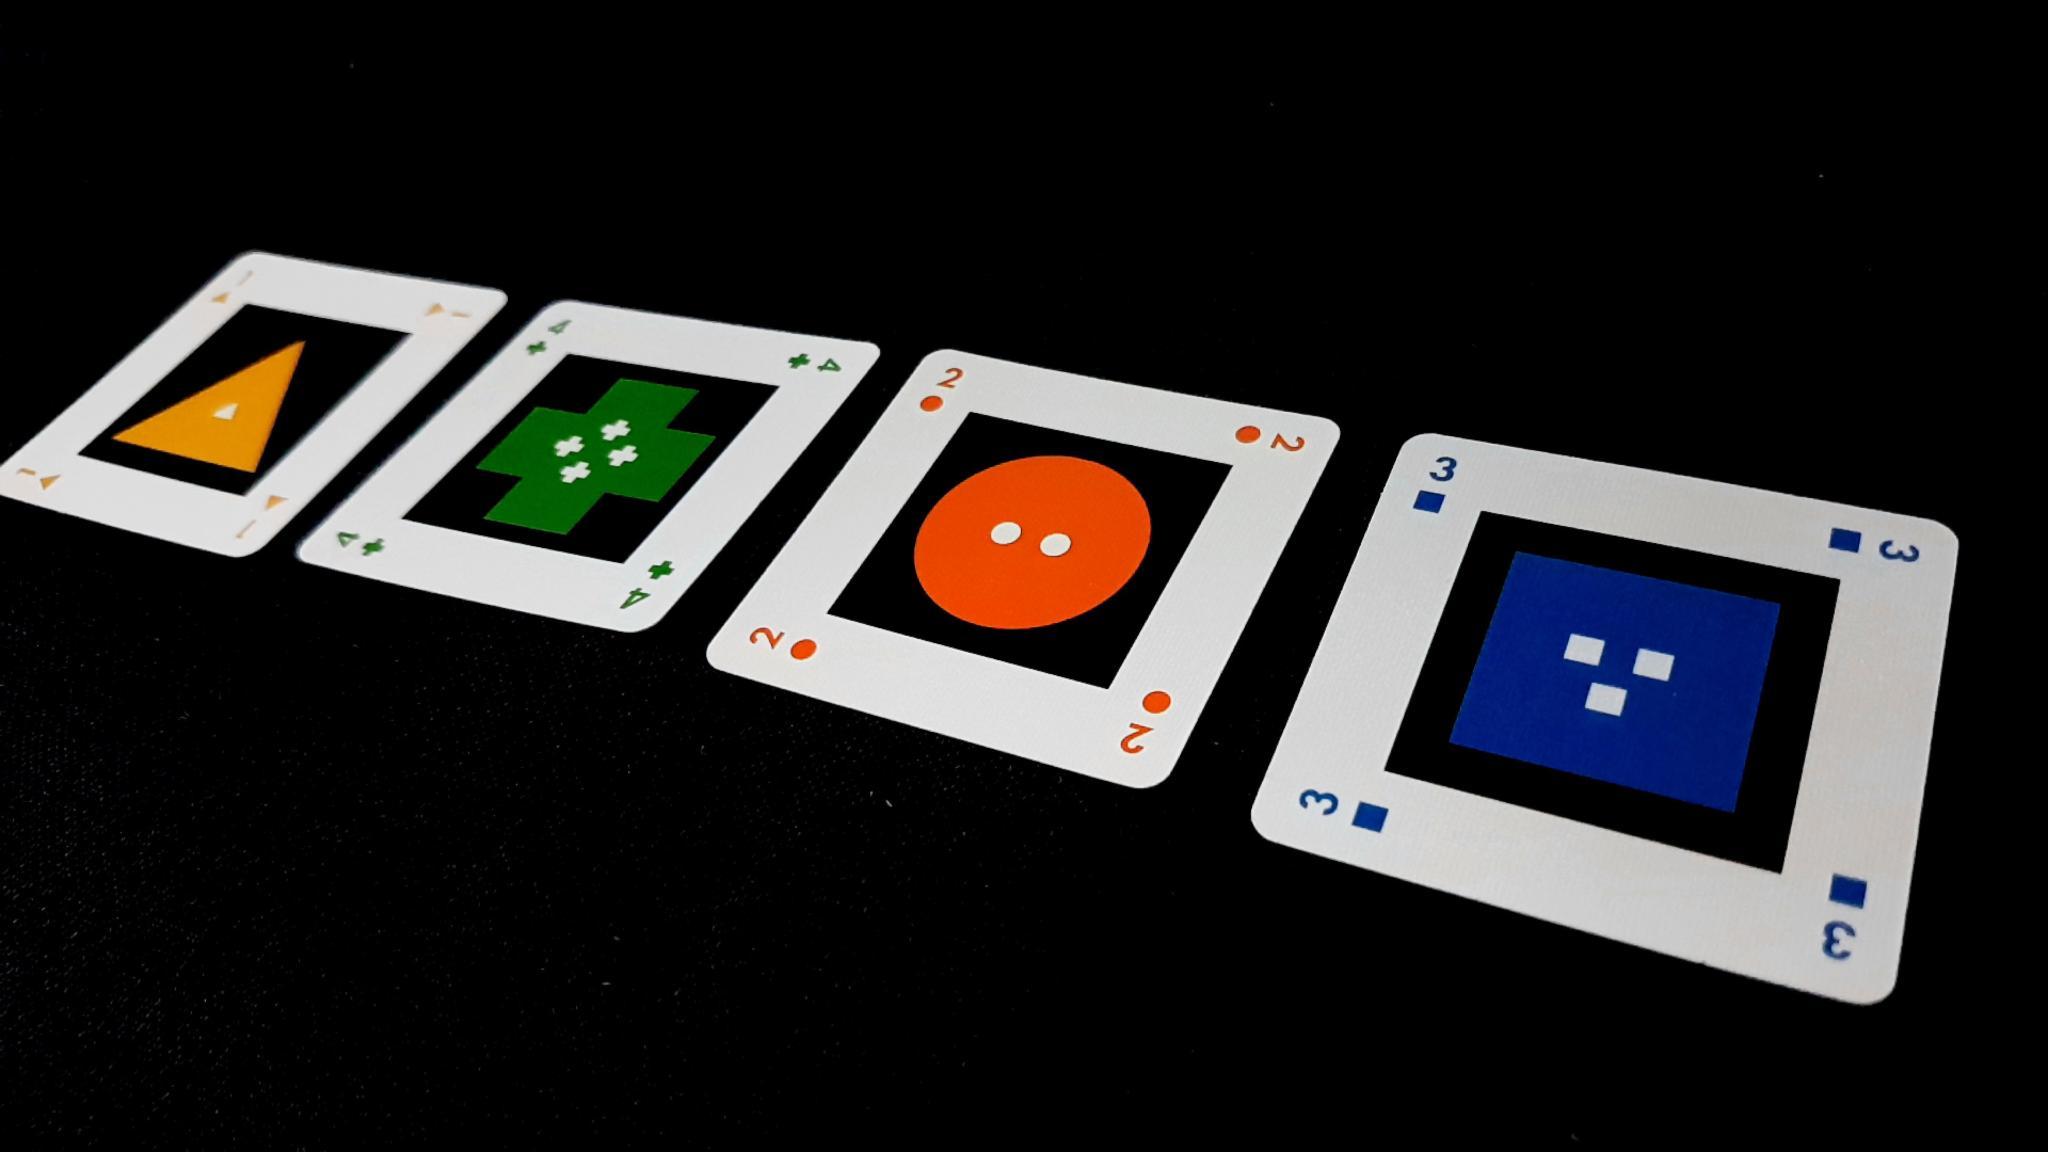 Cards in Iota